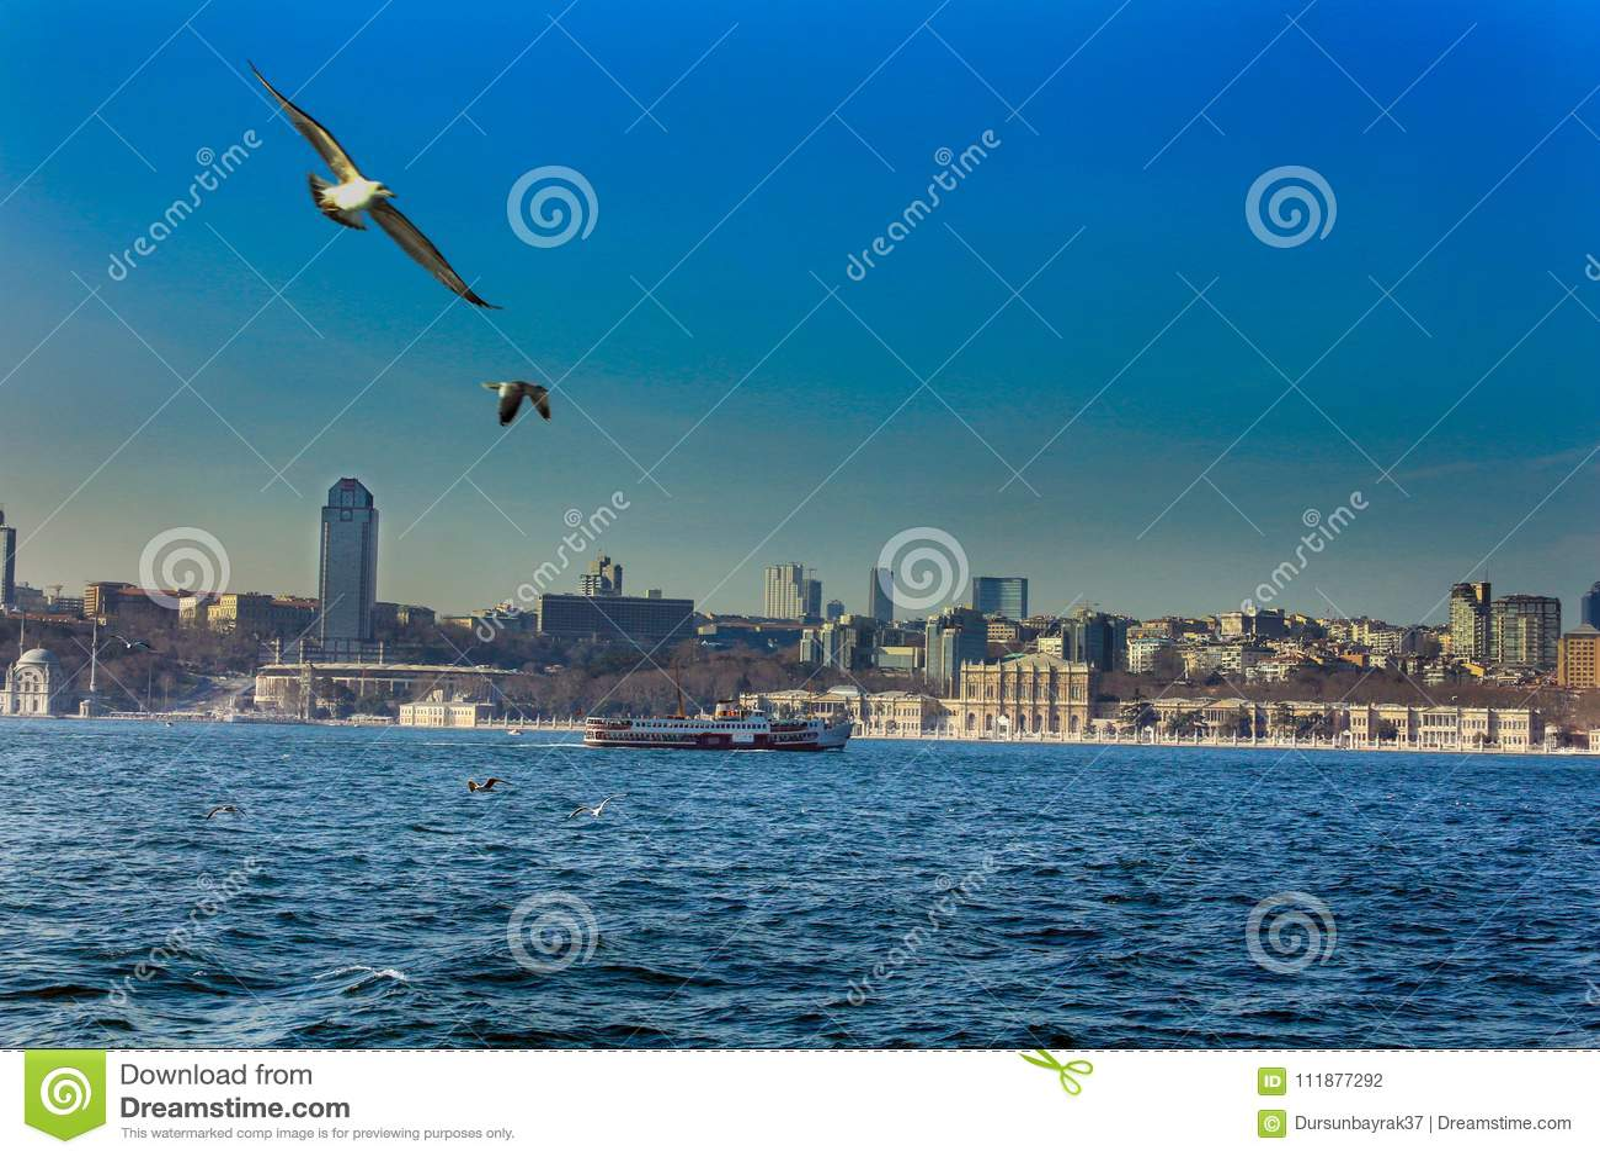 Дворец Стамбул Bosphorus Dolmabahce